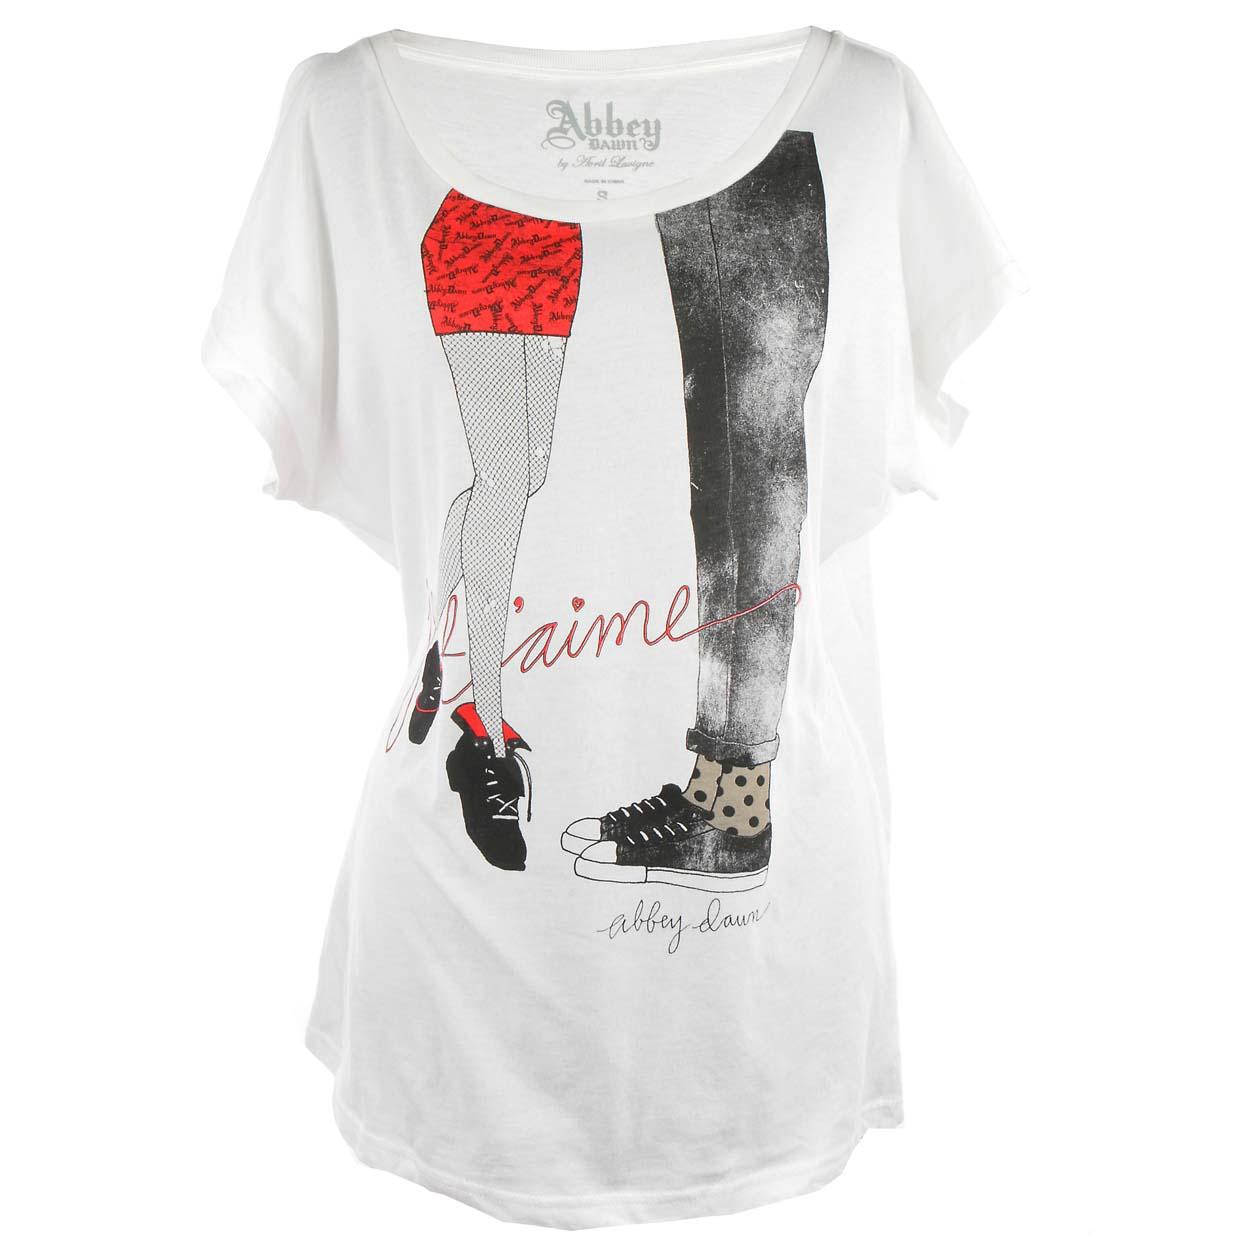 abbey_dawn_womens_je_taime_t_shirt_avril_lavigne_t_shirts_3.jpg